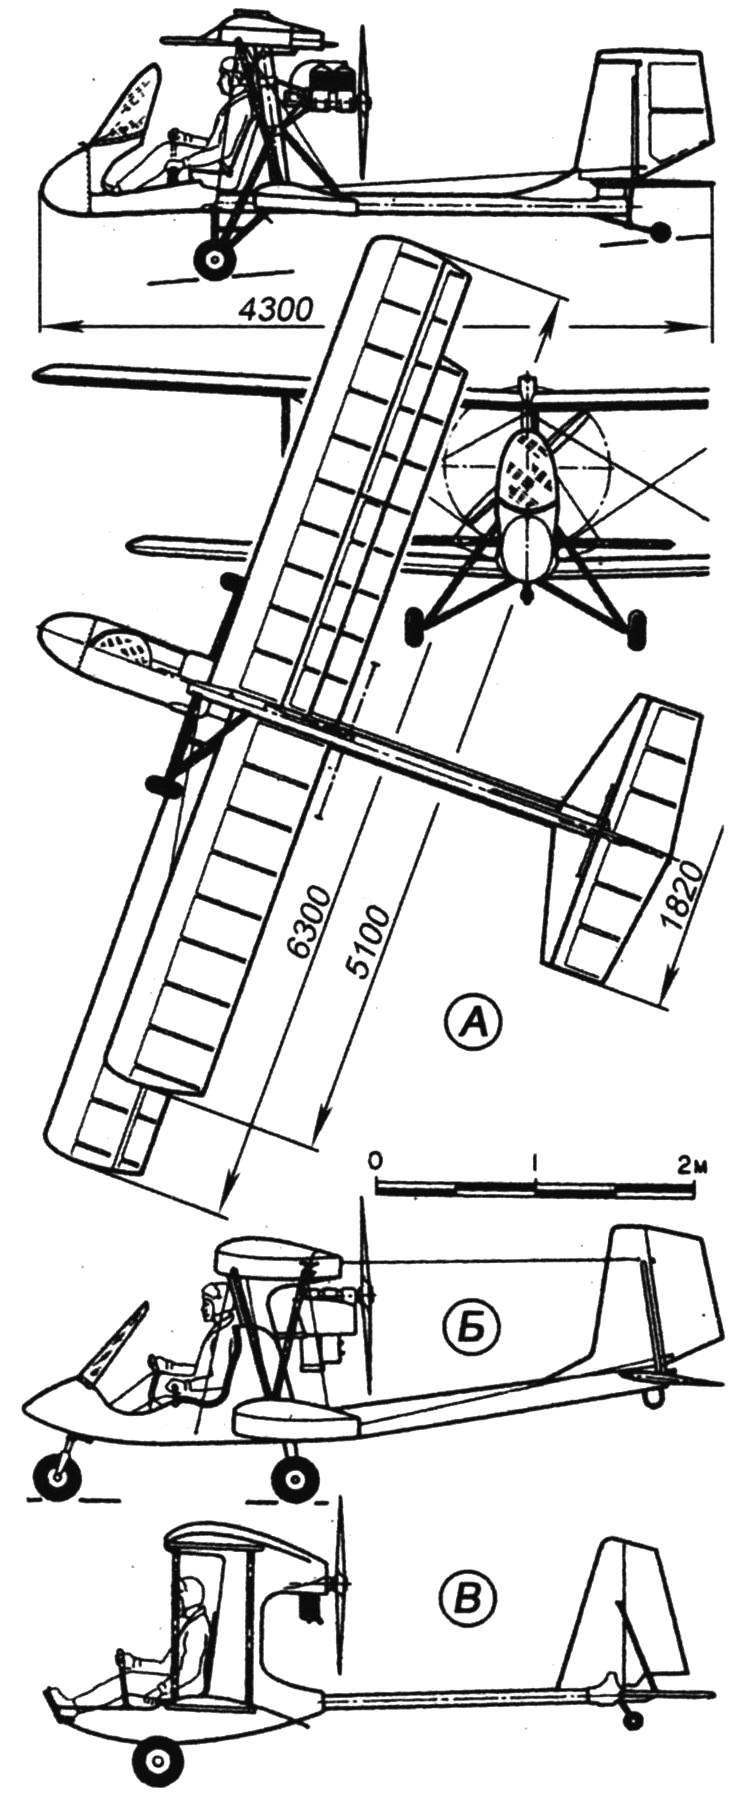 Single biplanes